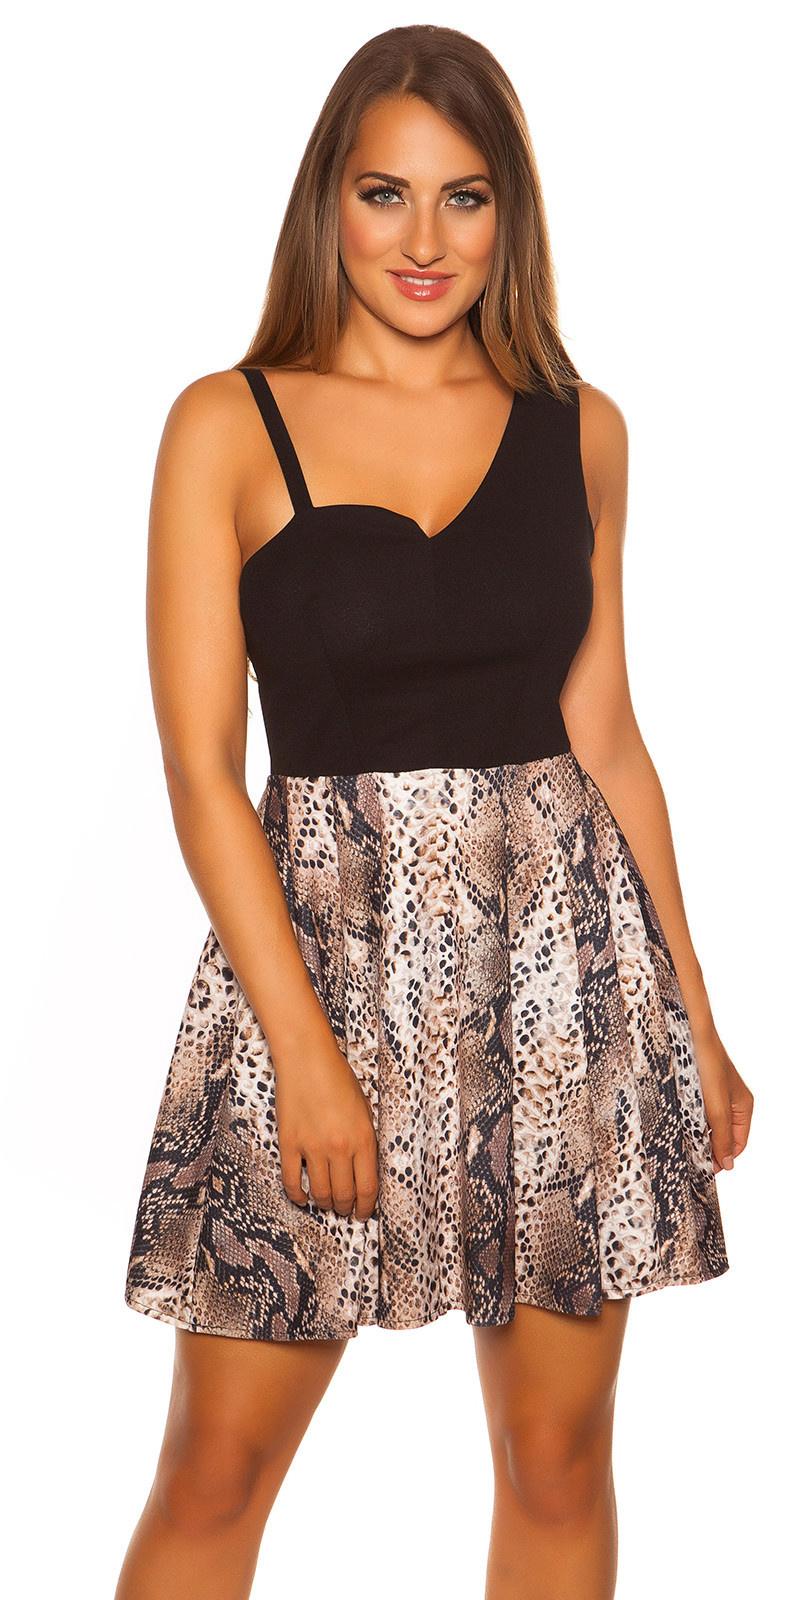 Sexy jurk asymmetrisch met slangen-print